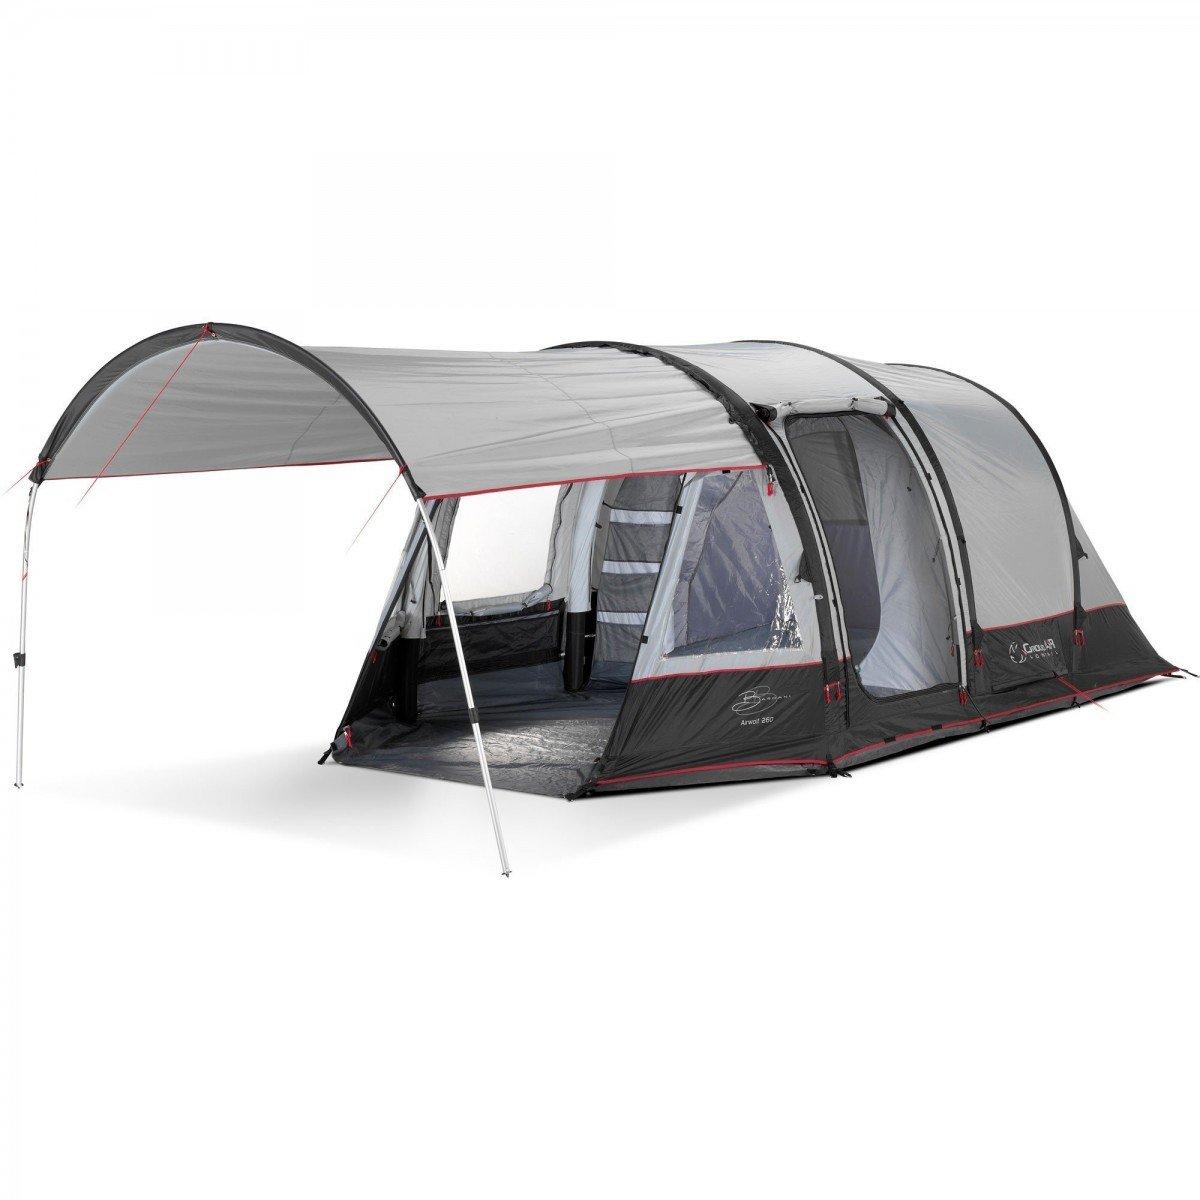 Airwolf 380 opblaasbare tent Air line Tenten Bardani